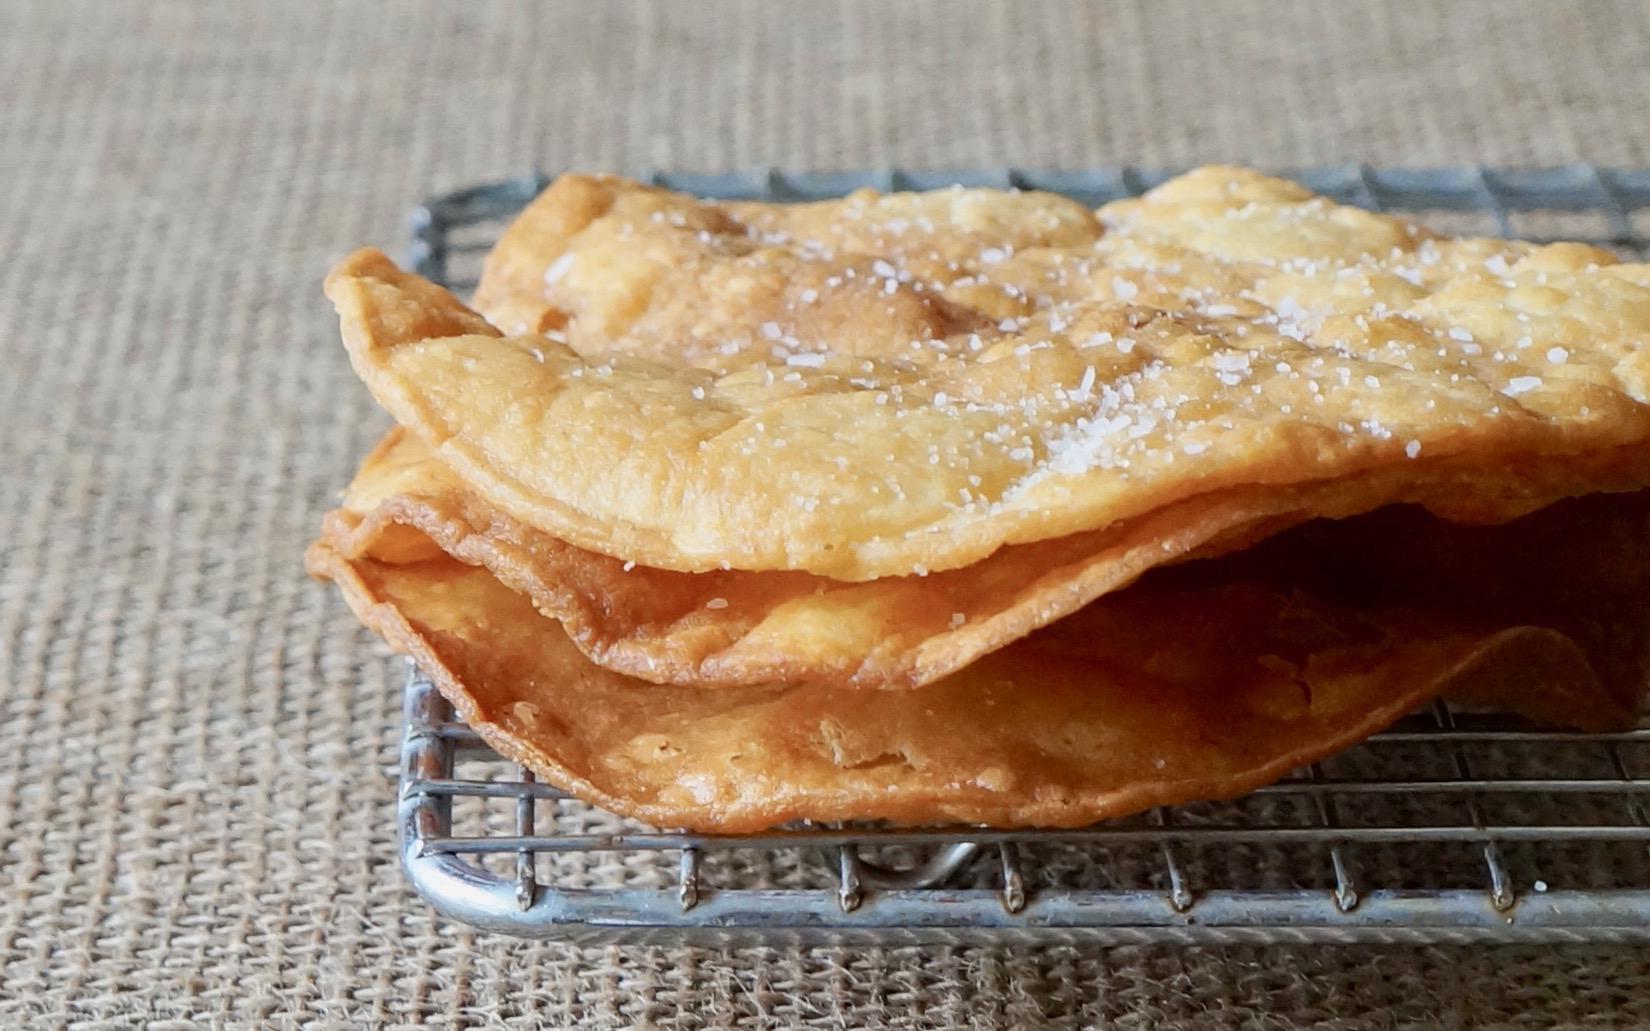 Authentic-Mexican-Cuisine-Tostada-Shells-Corn-Tortillas-Rebecca-Gordon-Editor-In-Chief-Buttermilk-Lipstick-Cooking-Techniques-RebeccaGordon-Pastry-Chef-Southern-Entertaining-Hostess-Birmingham-Alabama